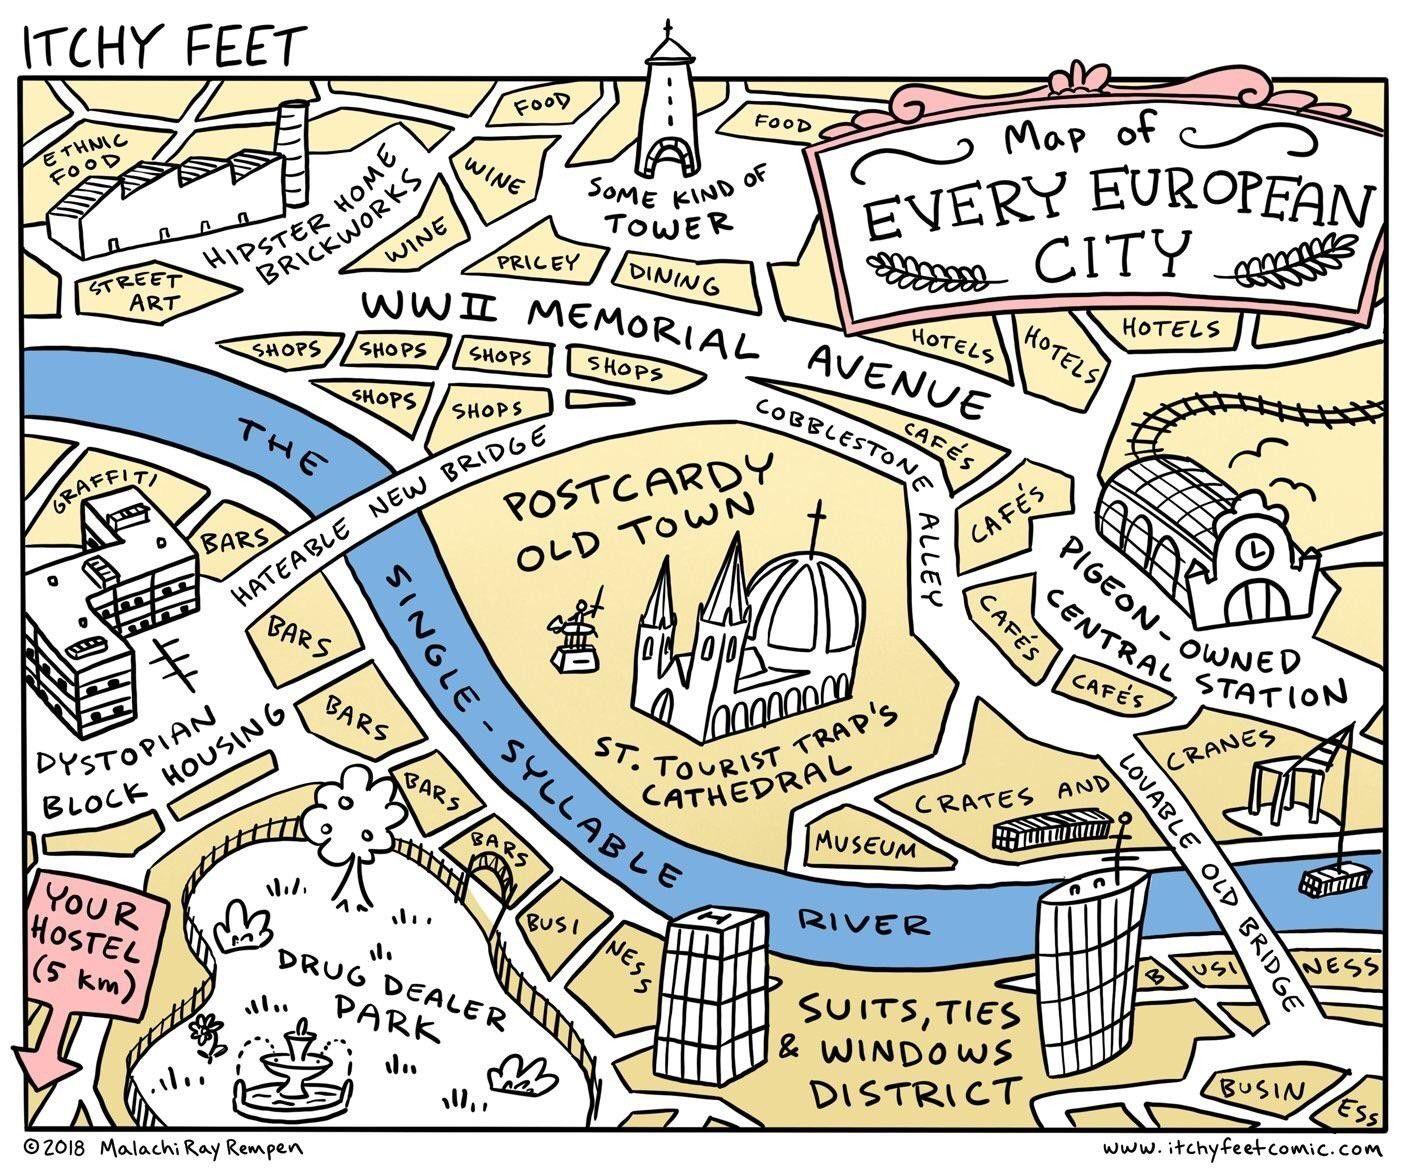 Europe European City Cities Map Maps Europeancity Europeancities Travel Traveling Europe European City Cities Map Maps Europeancity E Map Funny Humor